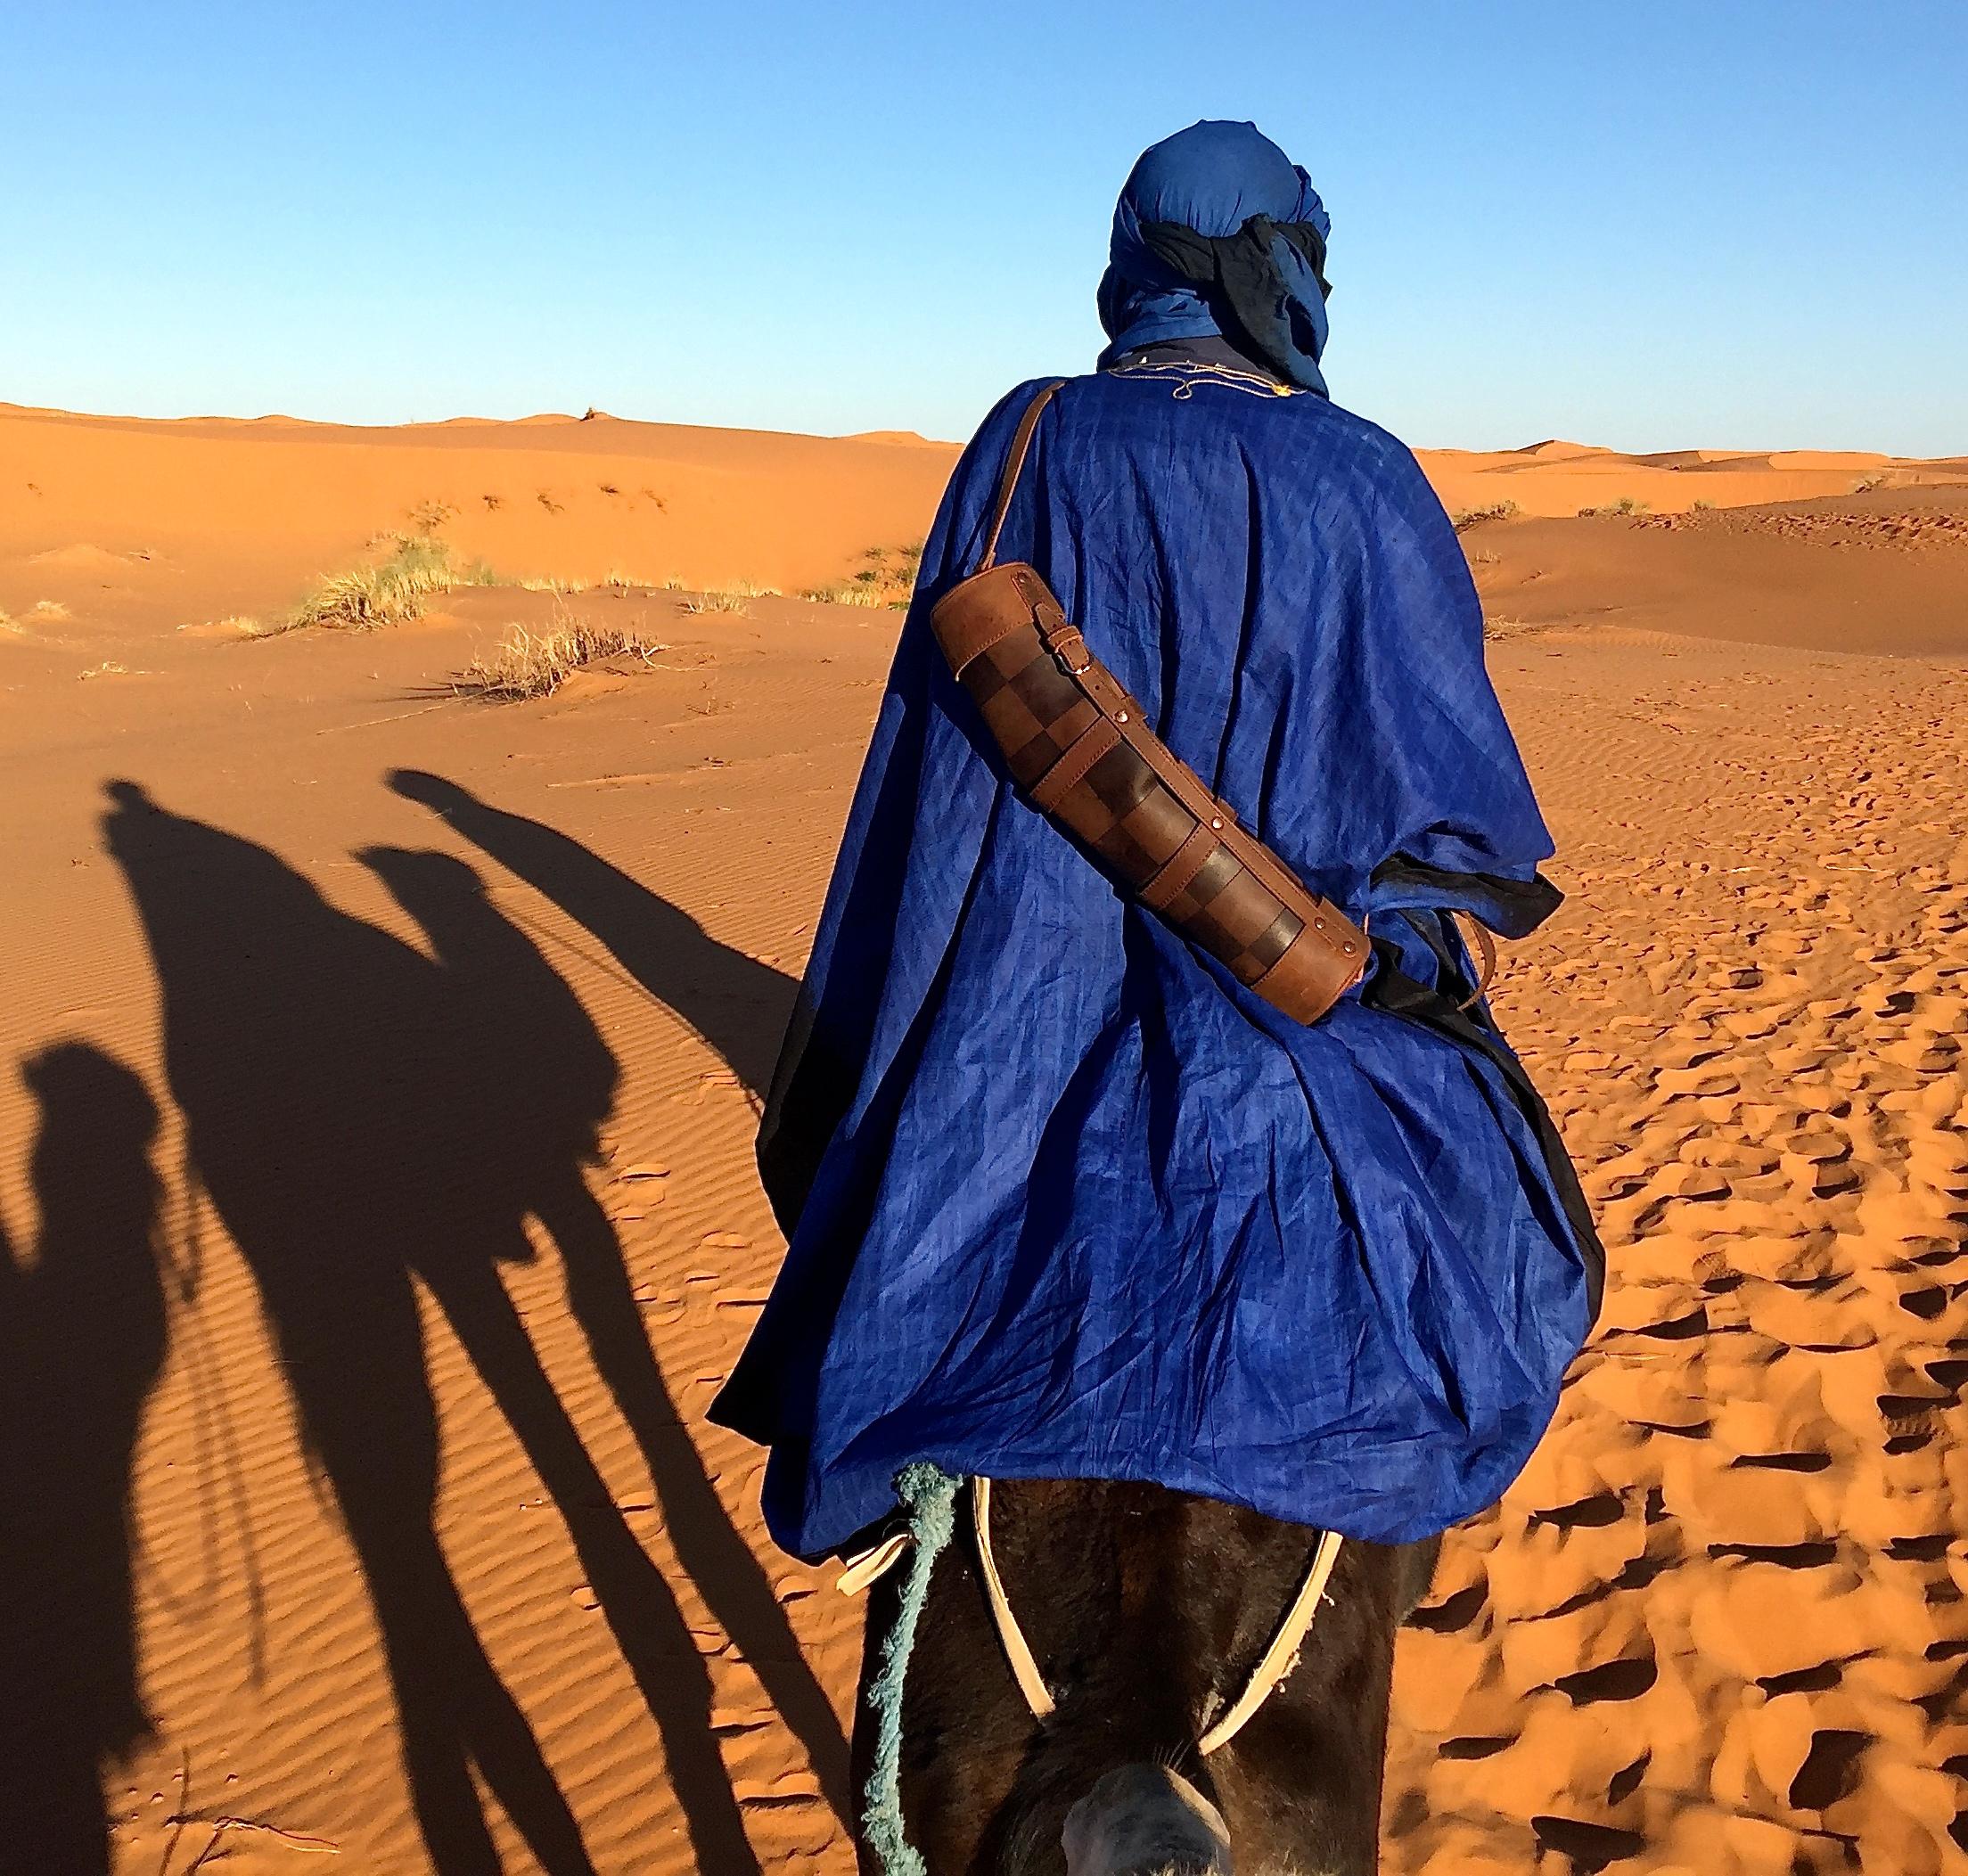 leather travel chess set in the Sahara Desert Morocco